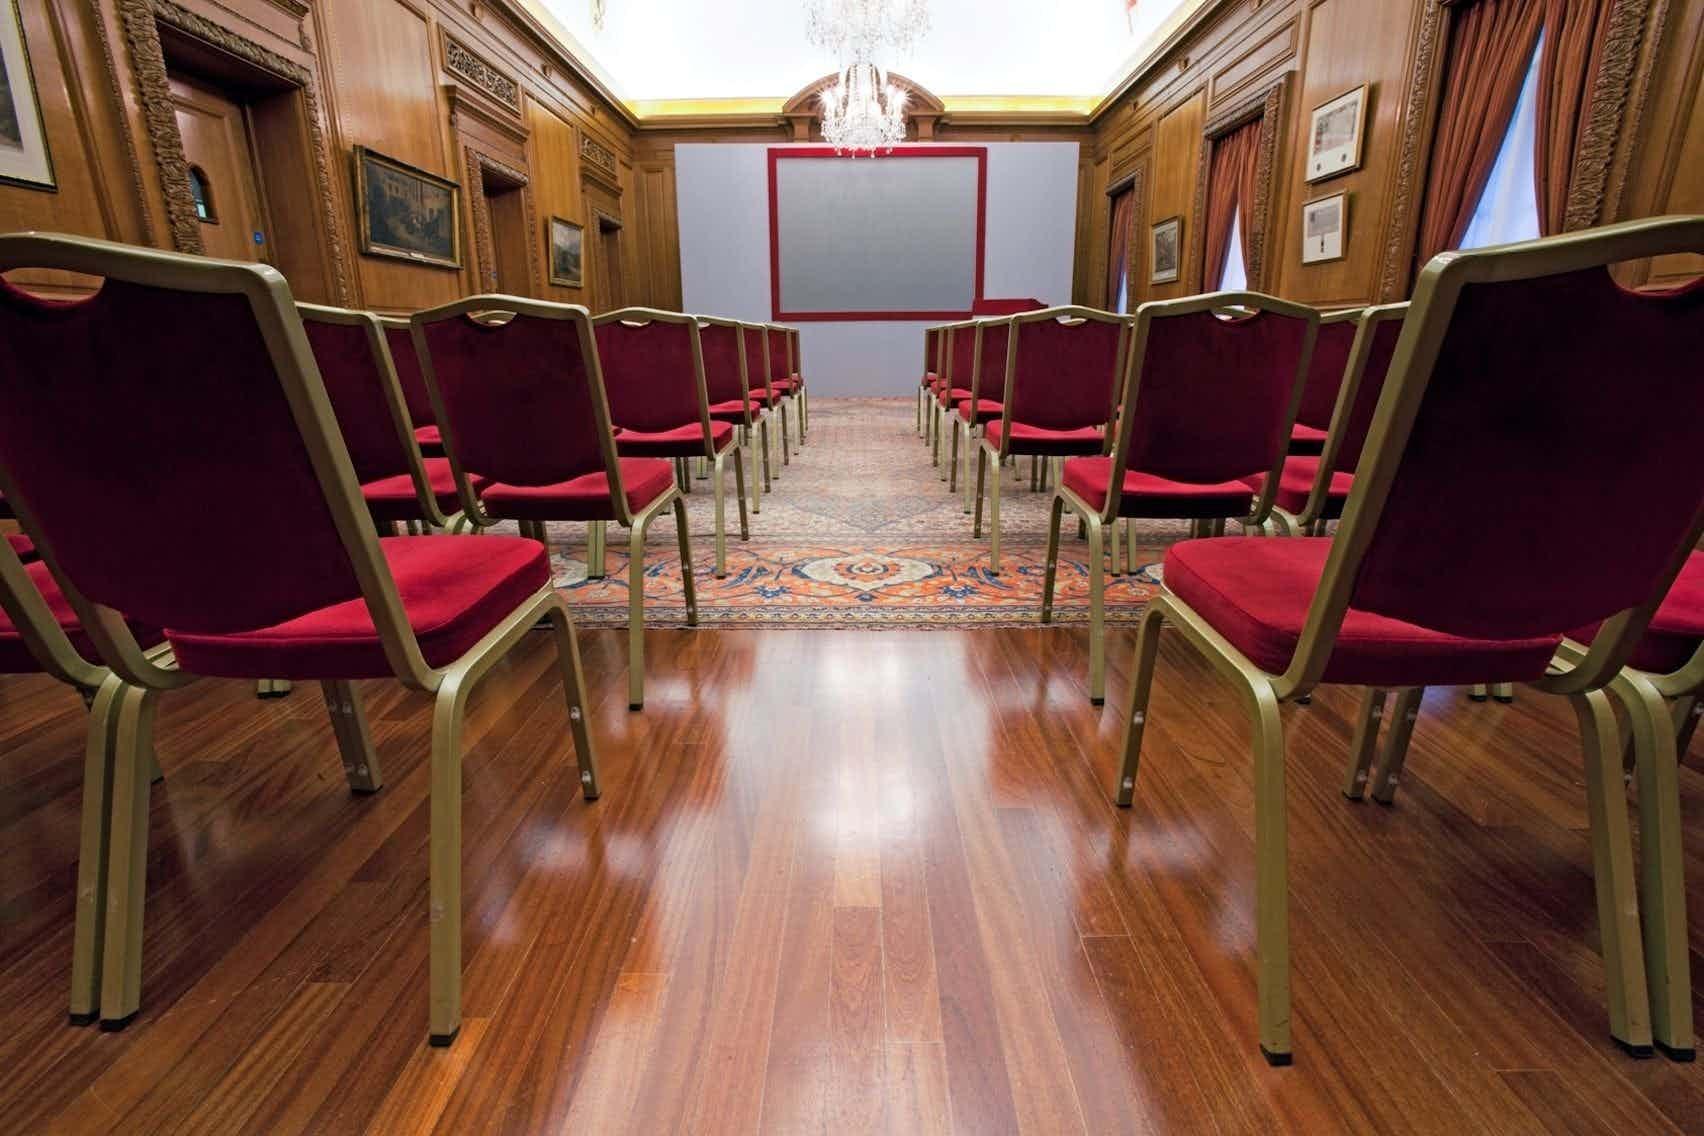 Livery Hall, Brewers' Hall